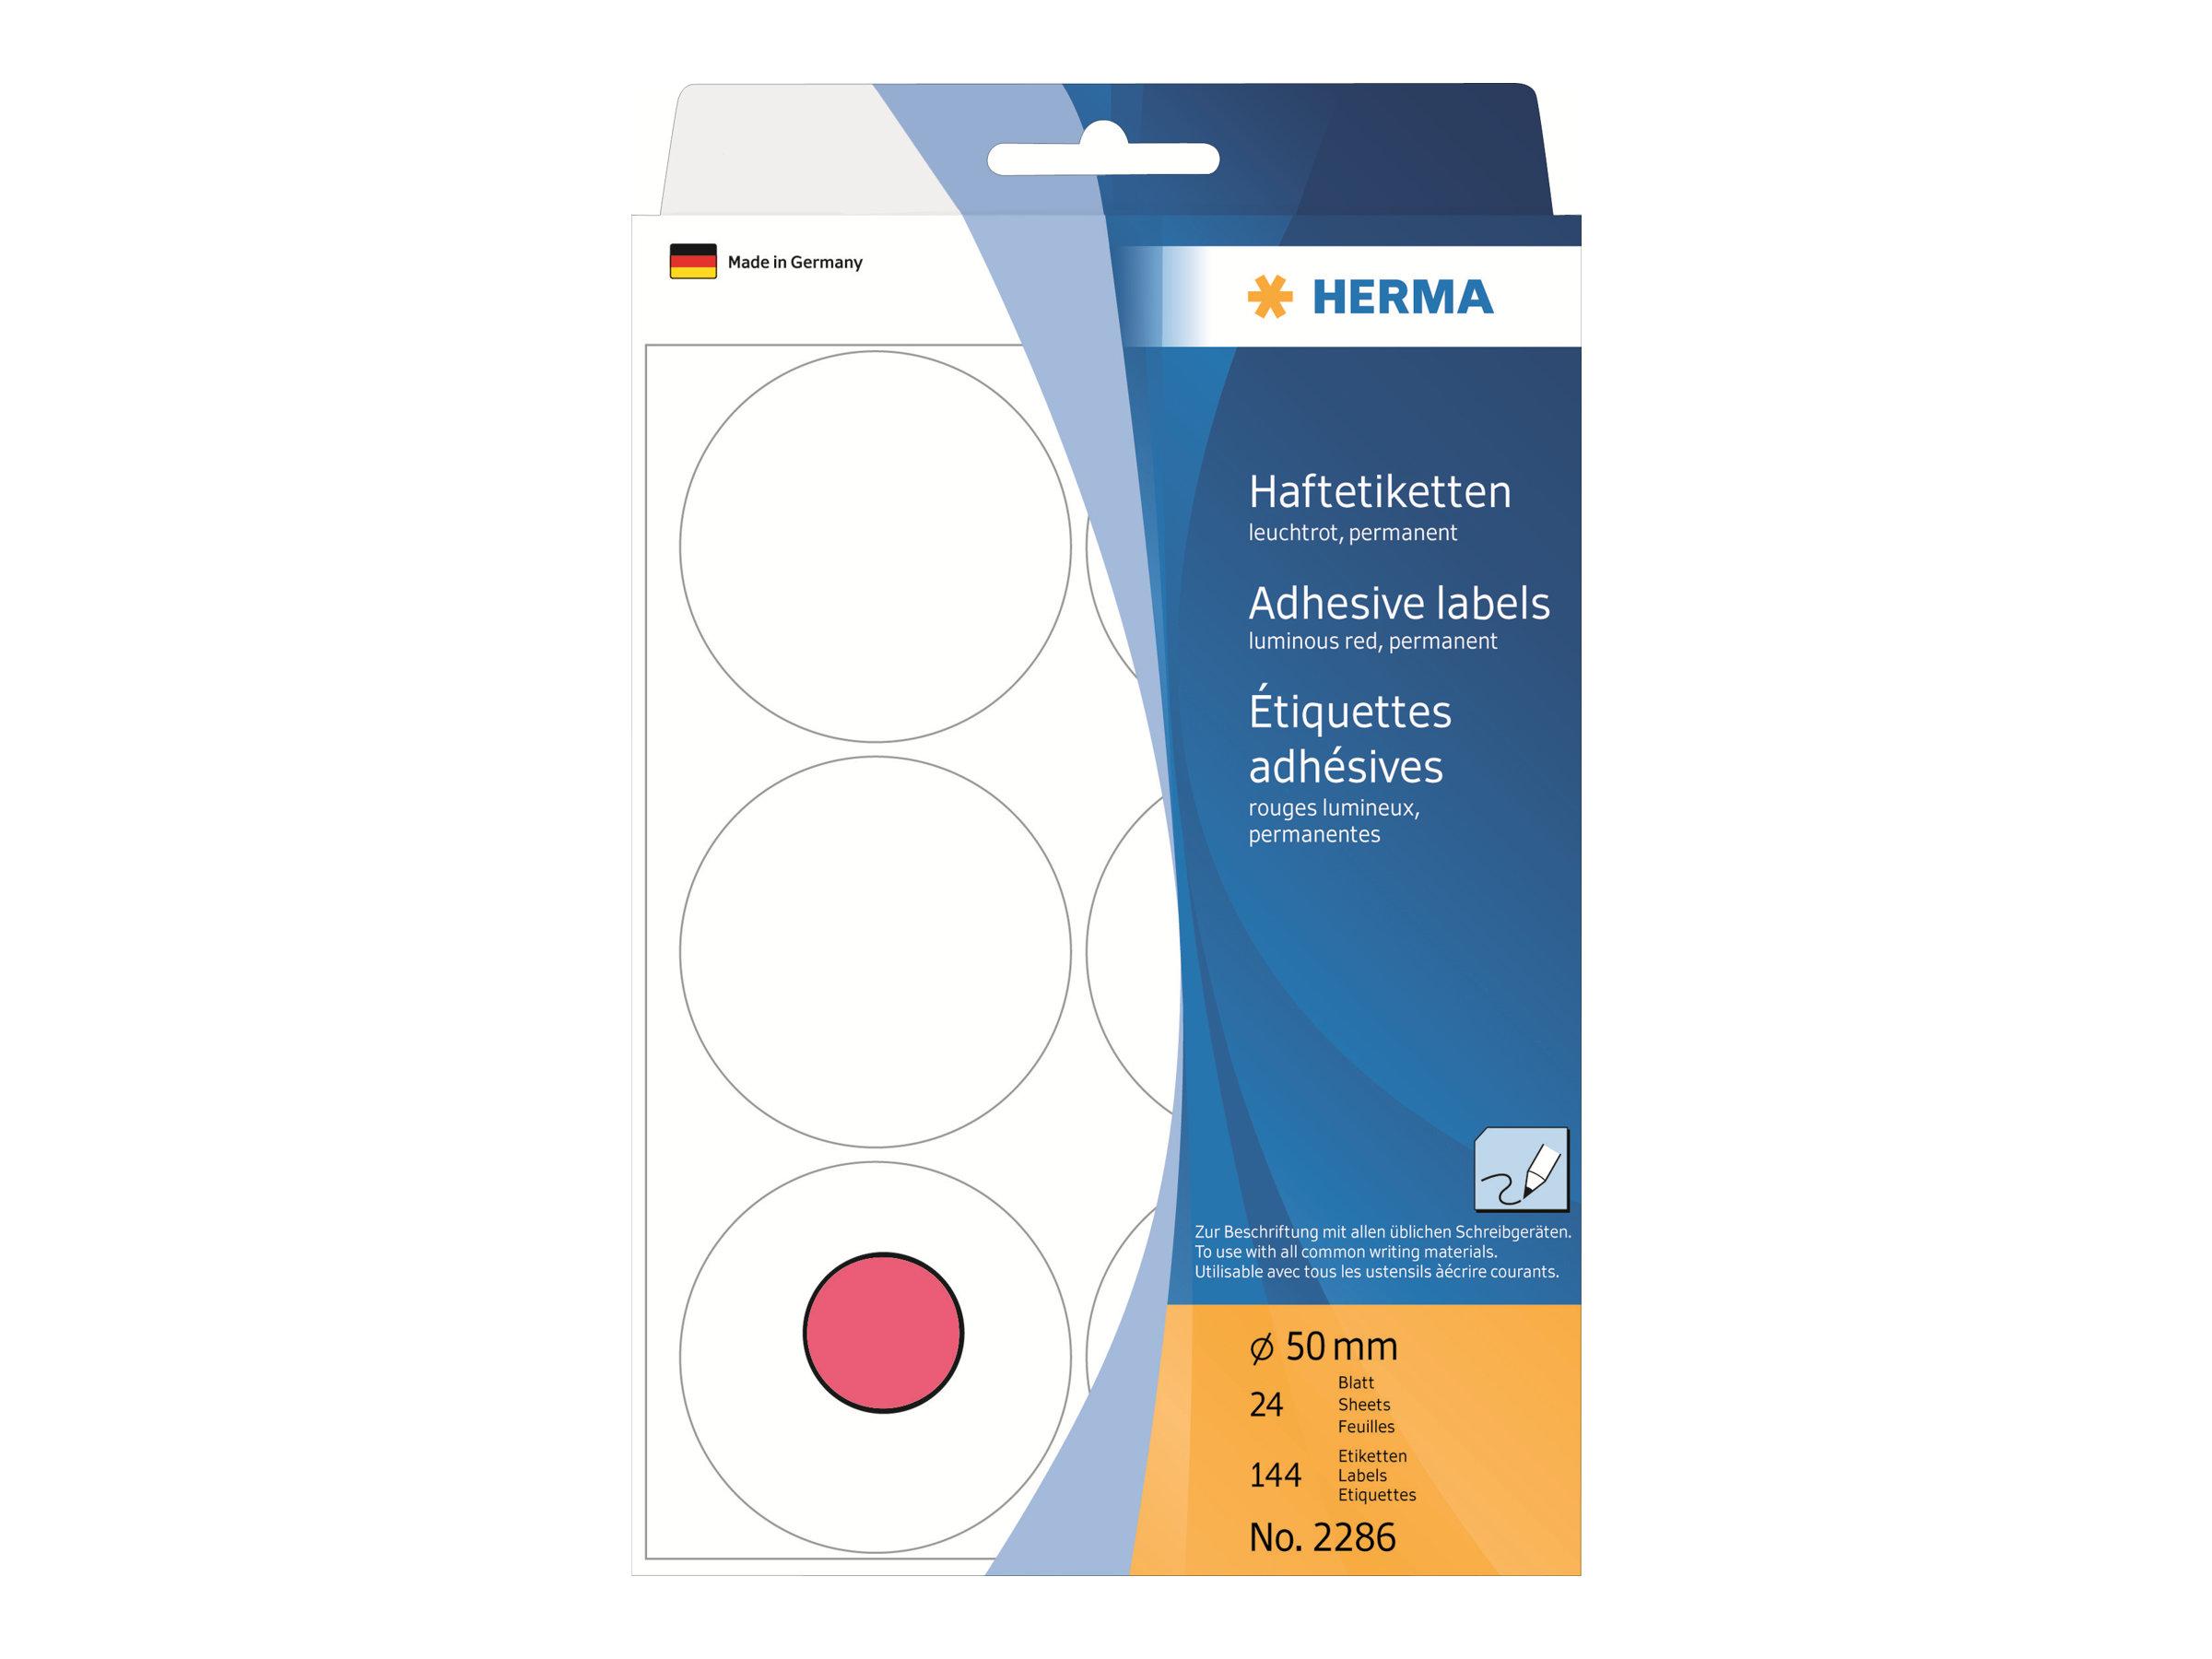 HERMA Papier - permanenter Klebstoff - Luminous Red - 50 mm rund 144 Etikett(en) (24 Bogen x 6)